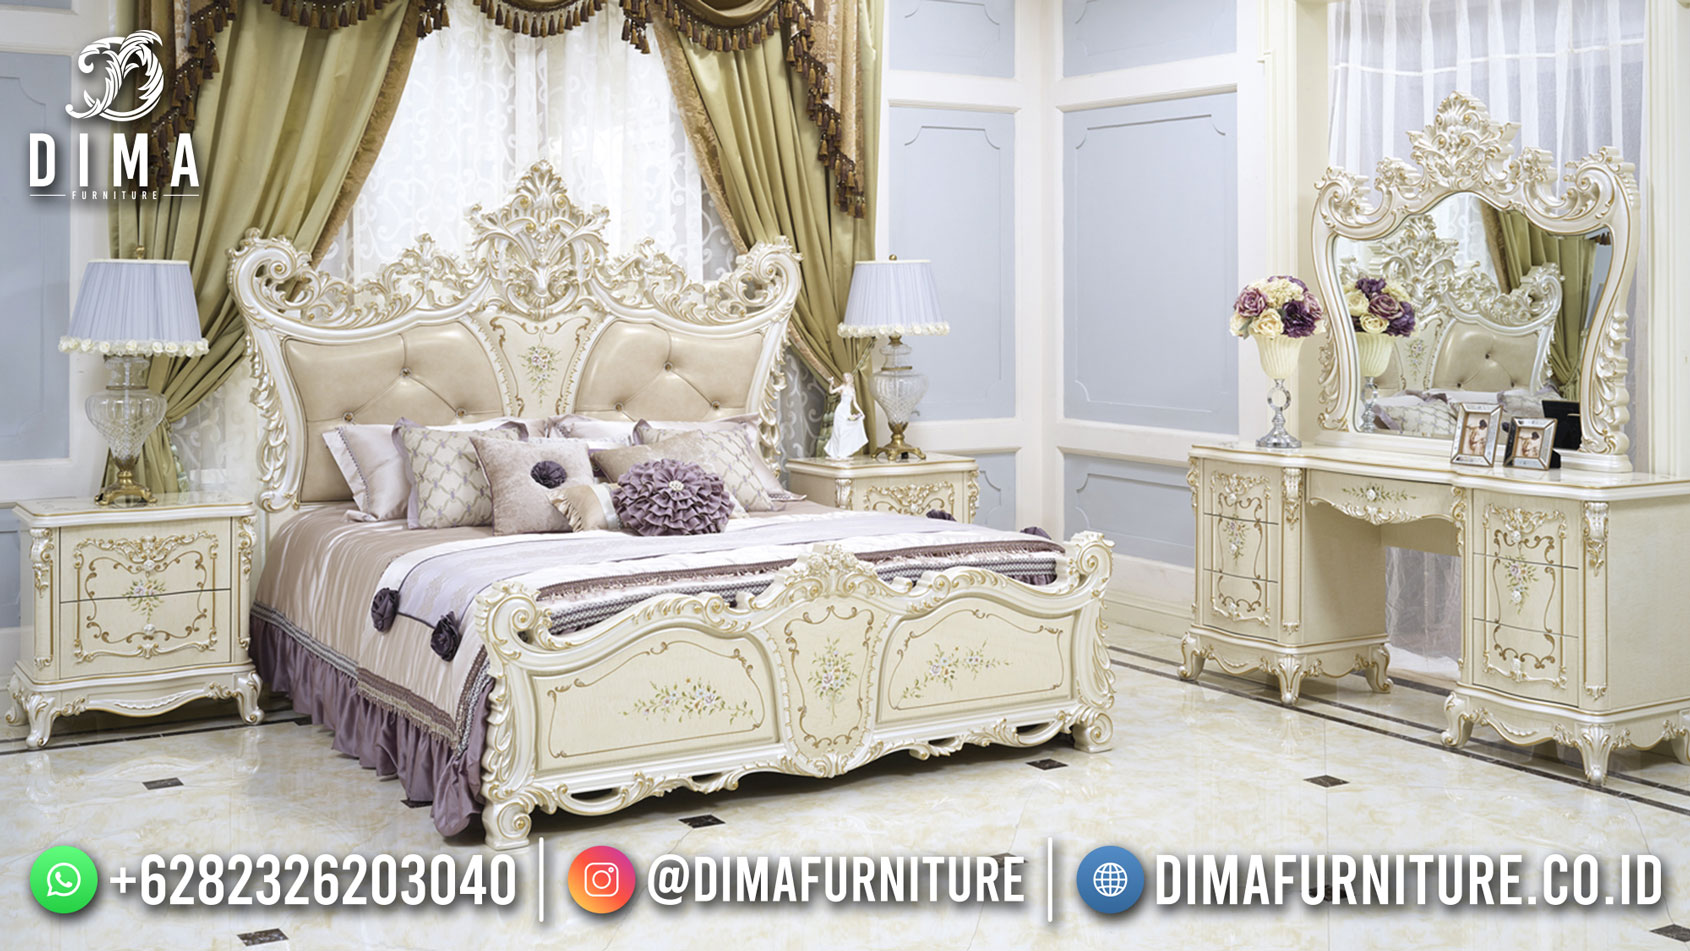 Jual Kamar Set Mewah Jepara Elegant Design Luxury Carving ST-1407